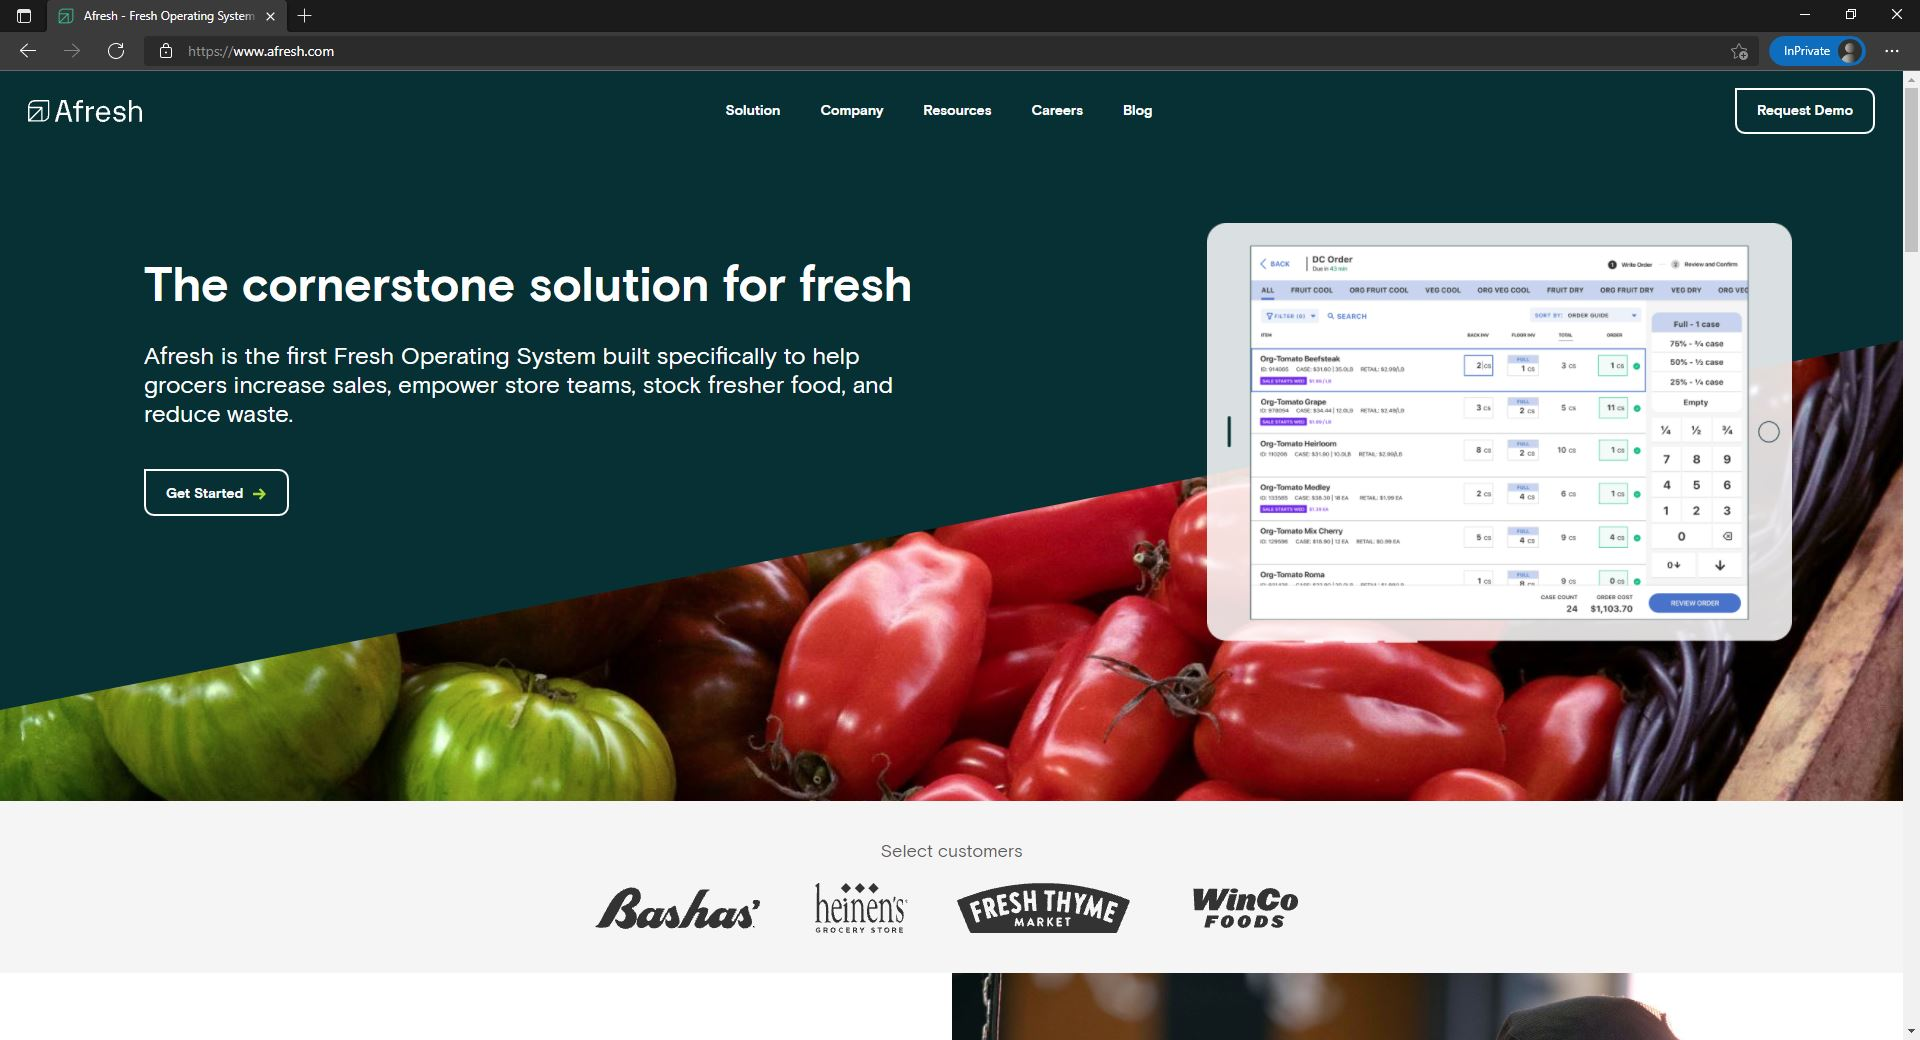 Afresh website homepage